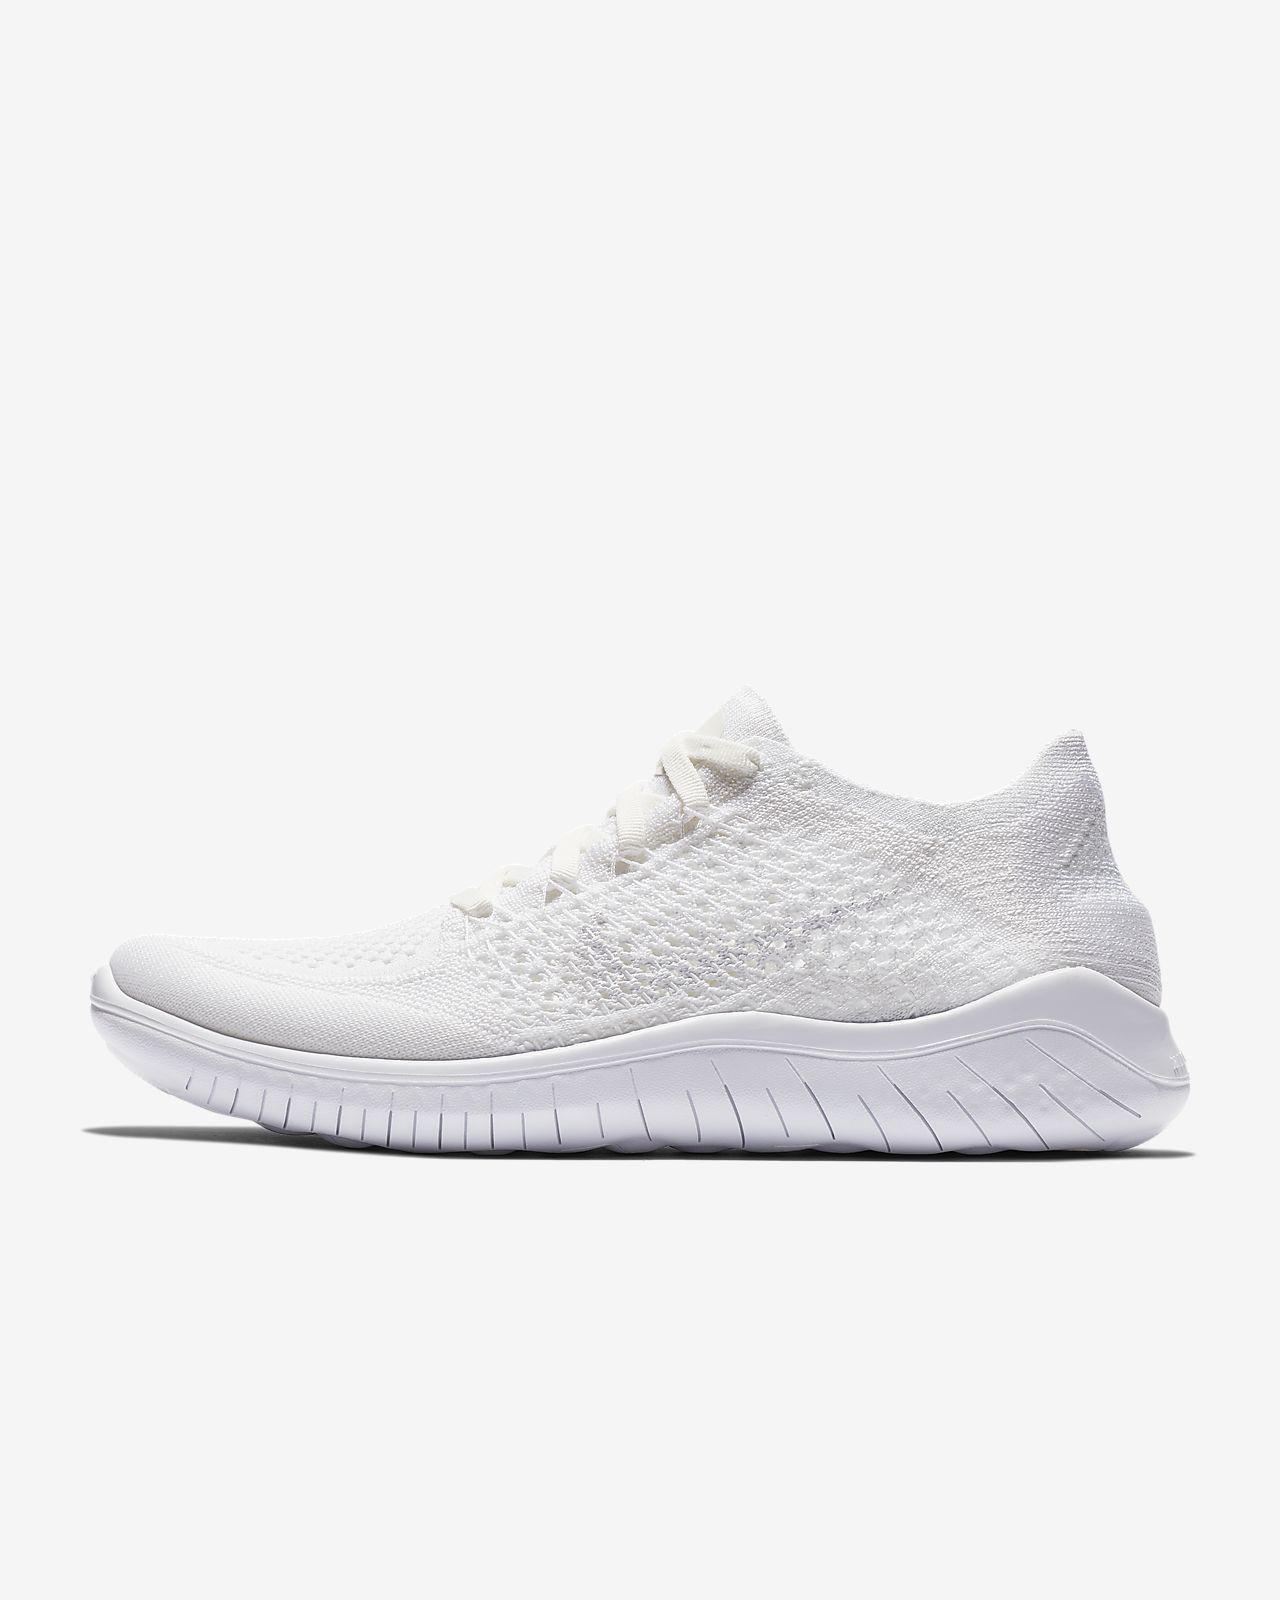 1ab4c5887f3f Nike Free Rn Flyknit 2018 Women s Running Shoe - 11.5